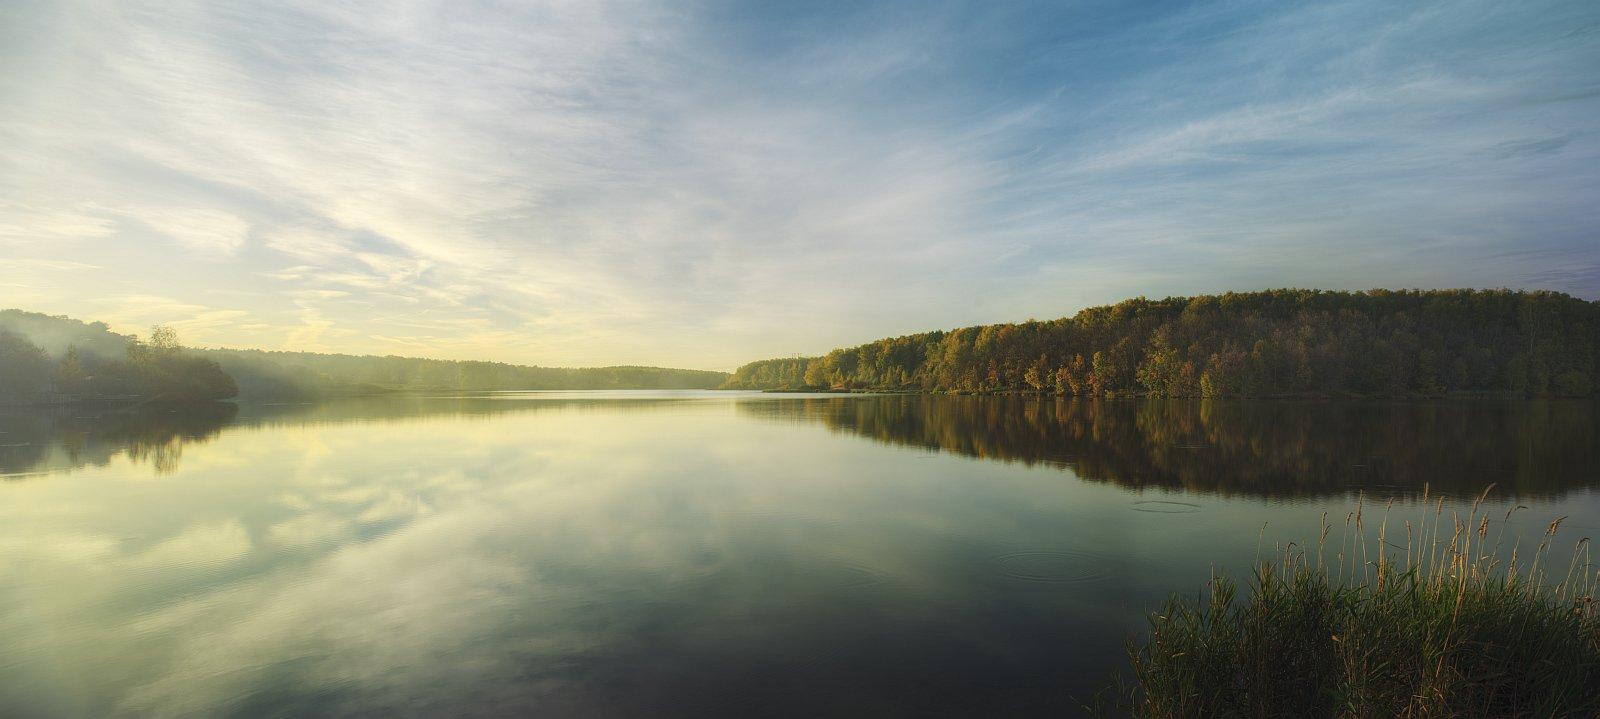 пейзаж, панорама, природа, река, вечер, осень, закат, Ефимов Александр